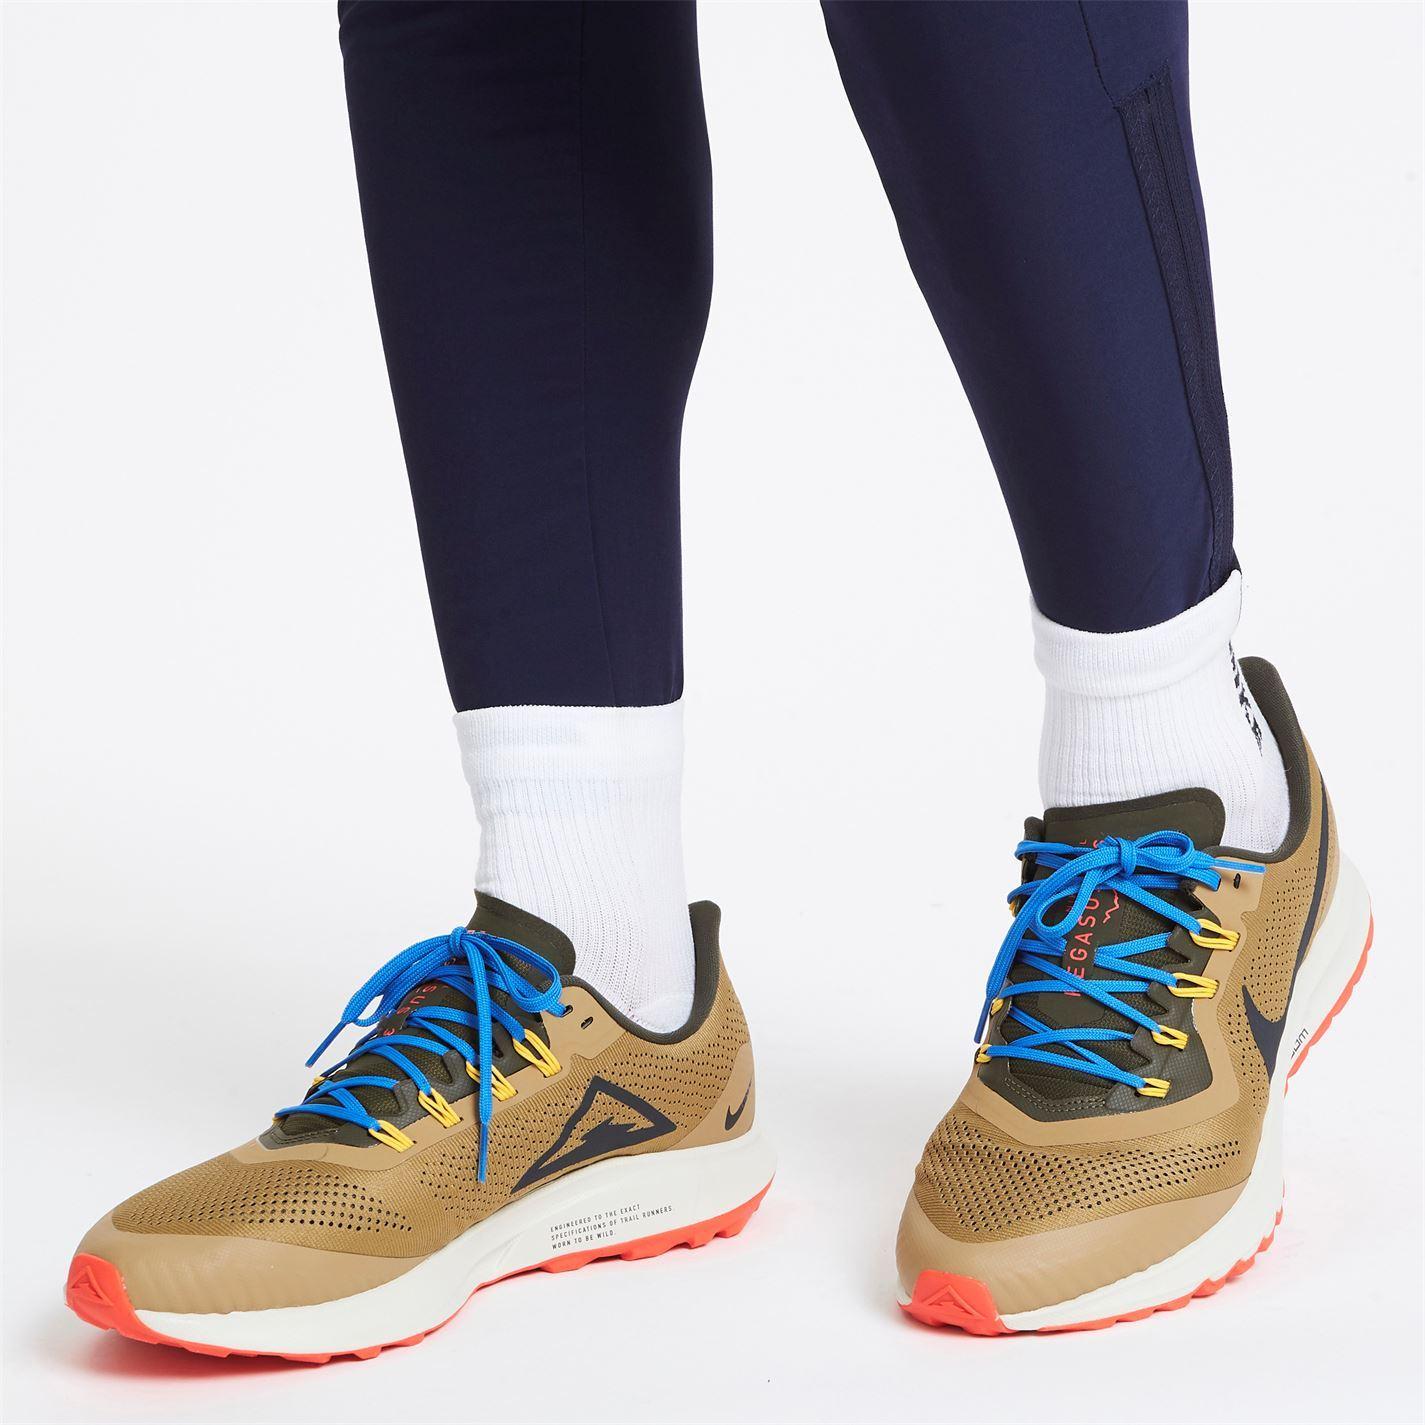 nike zapatillas hombre marron